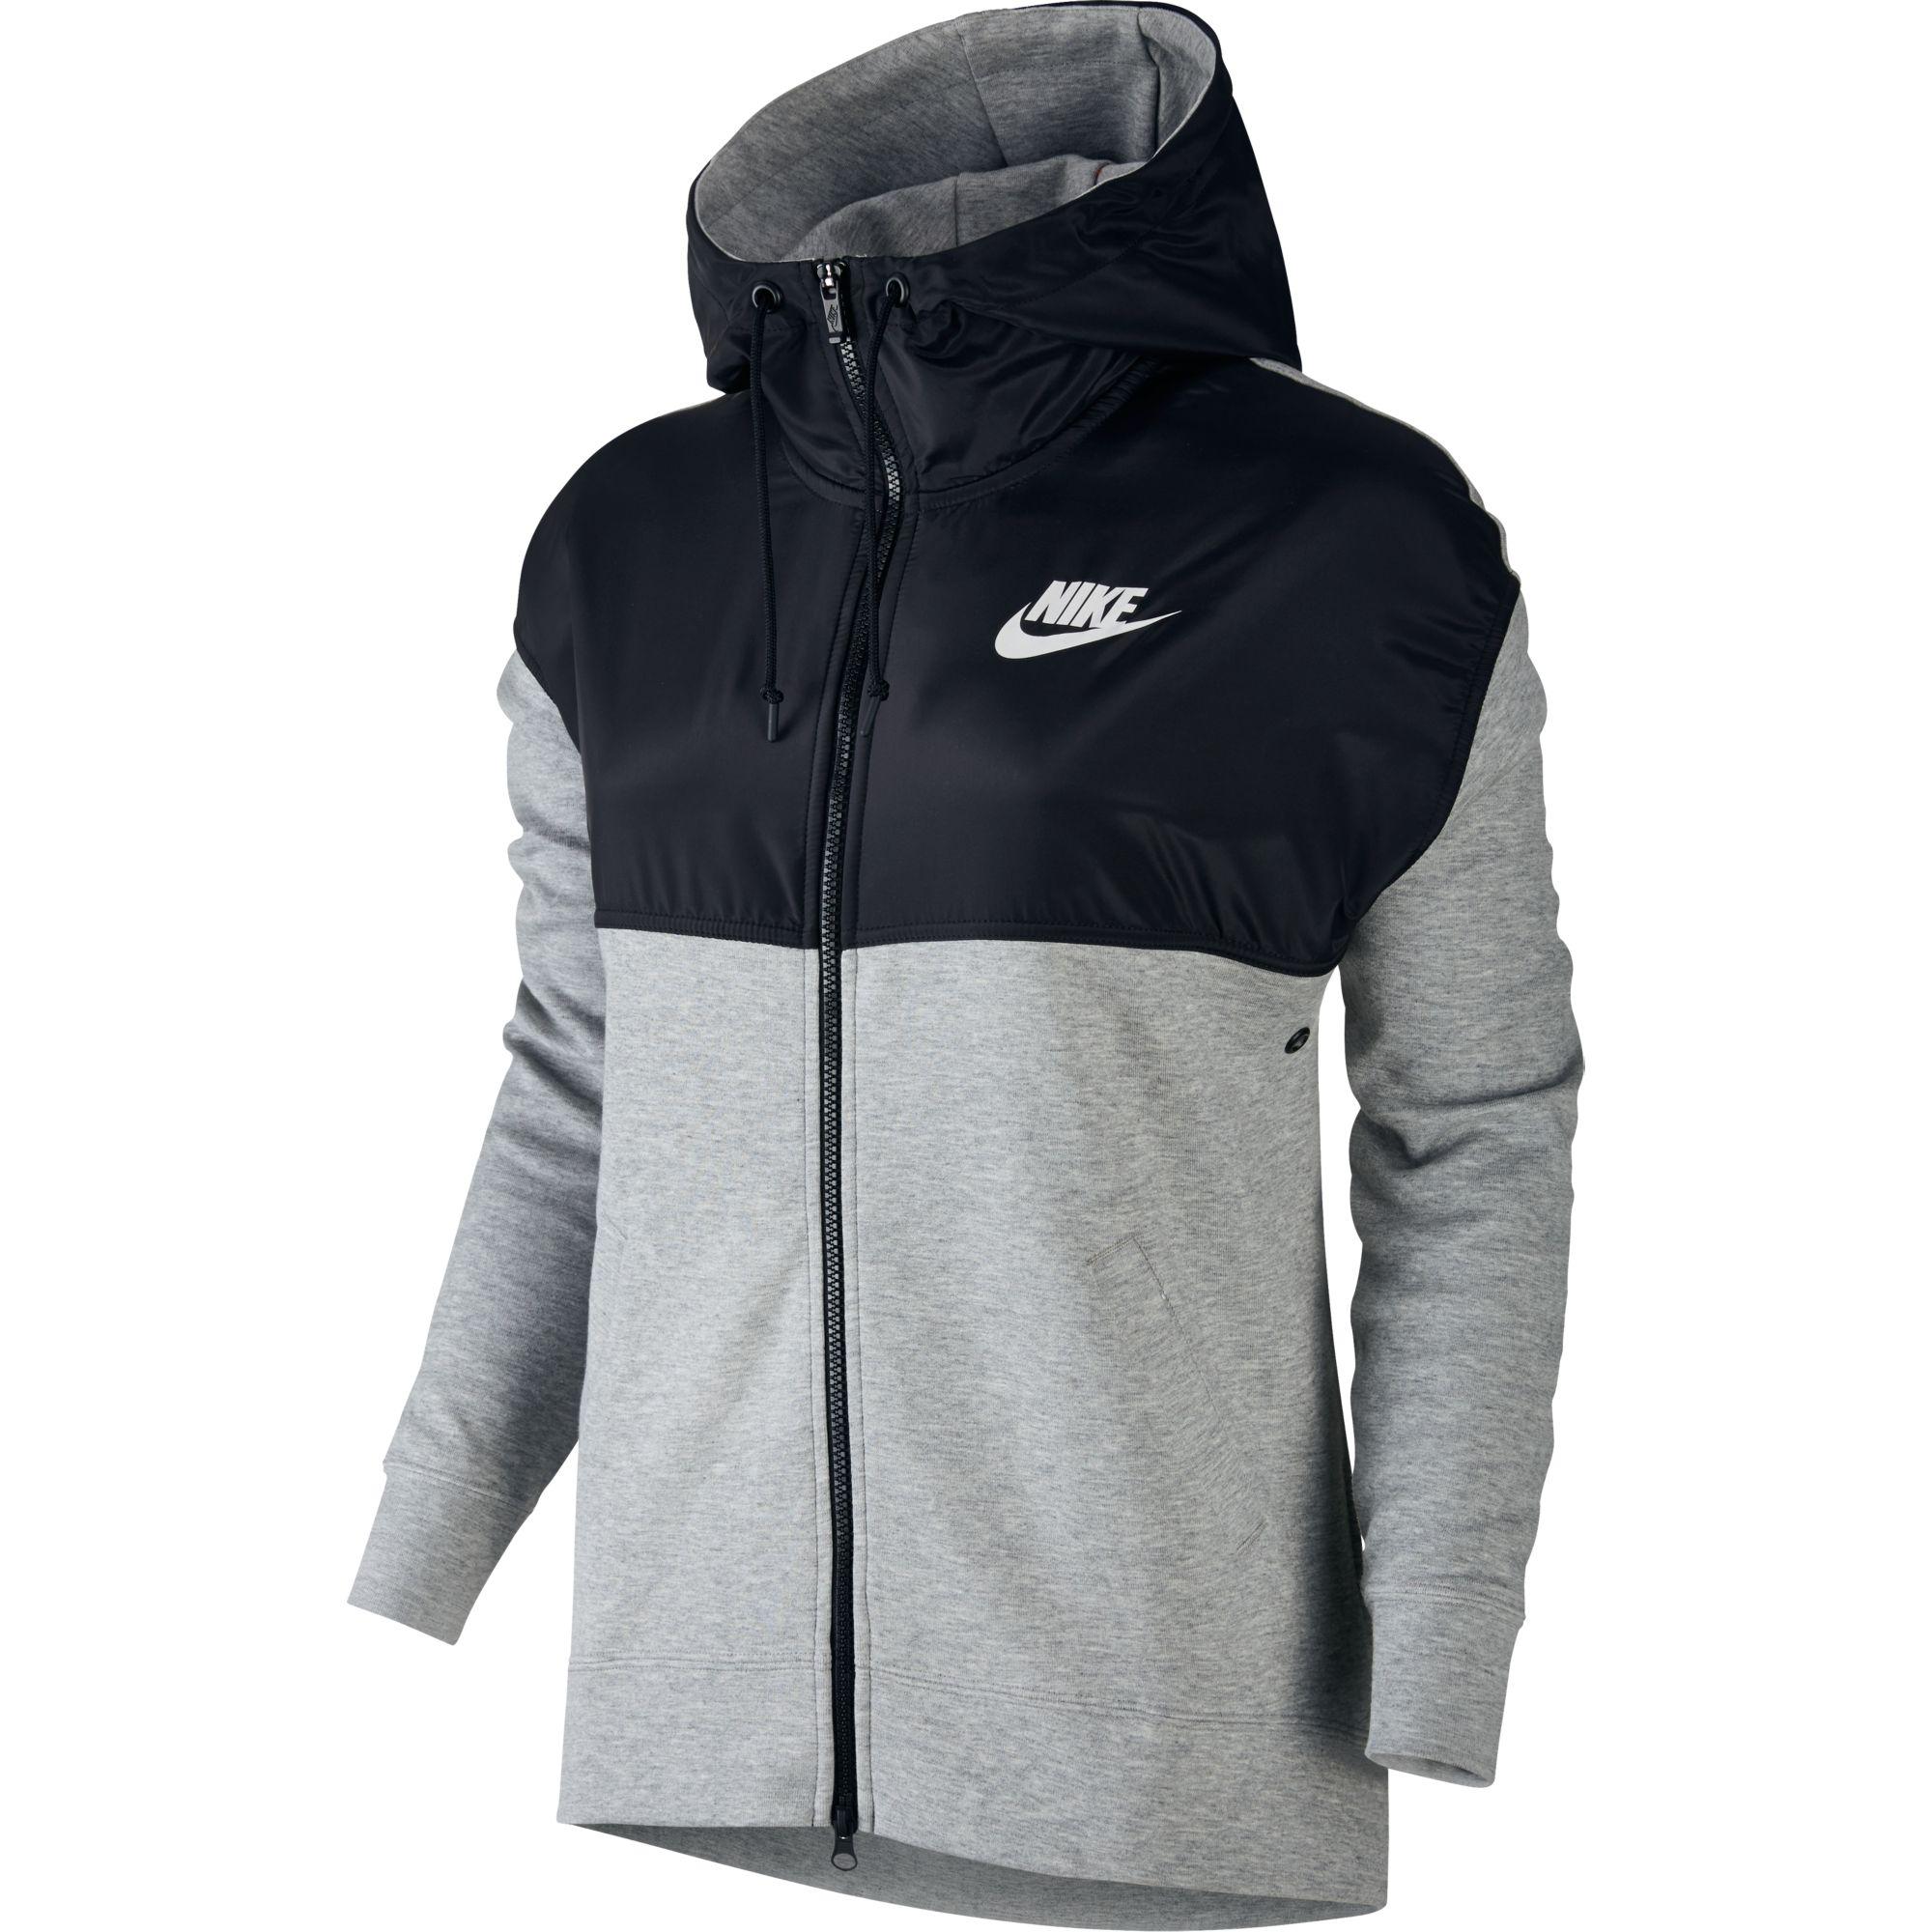 Femme Sportswear Nike Fwwobqe Capuche À Advance Sweat Pour 15 Ekinsport qpLMVGzSU